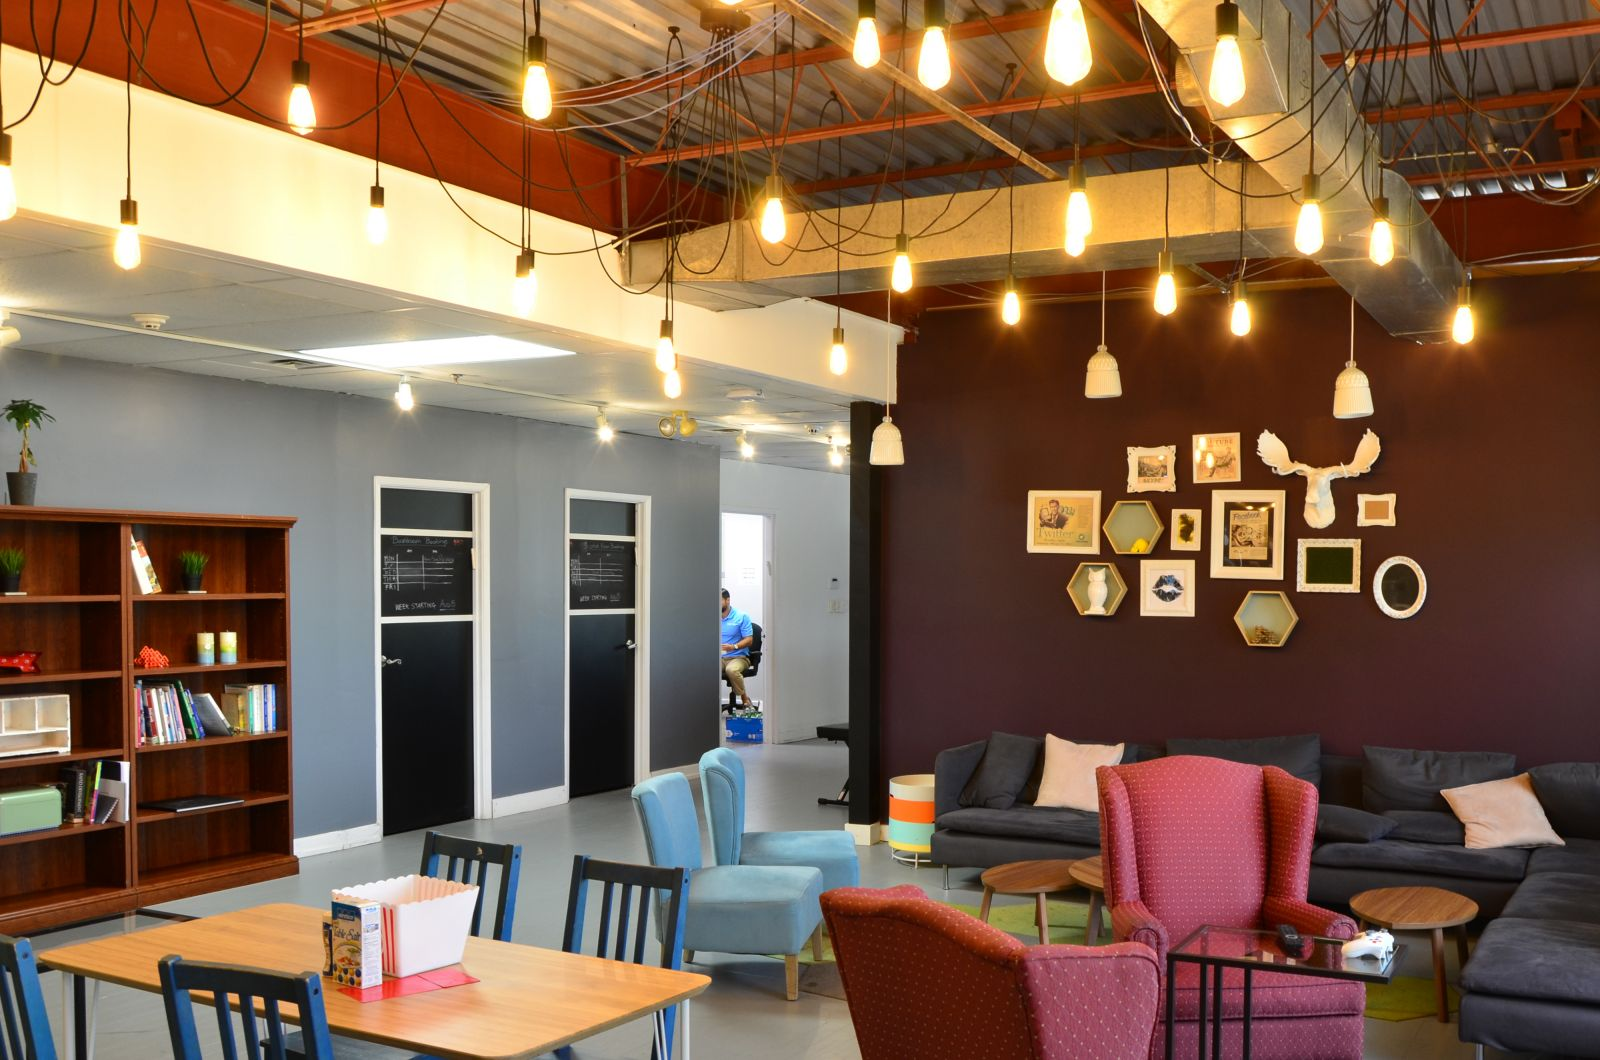 Northspace Coworking Space in Toronto